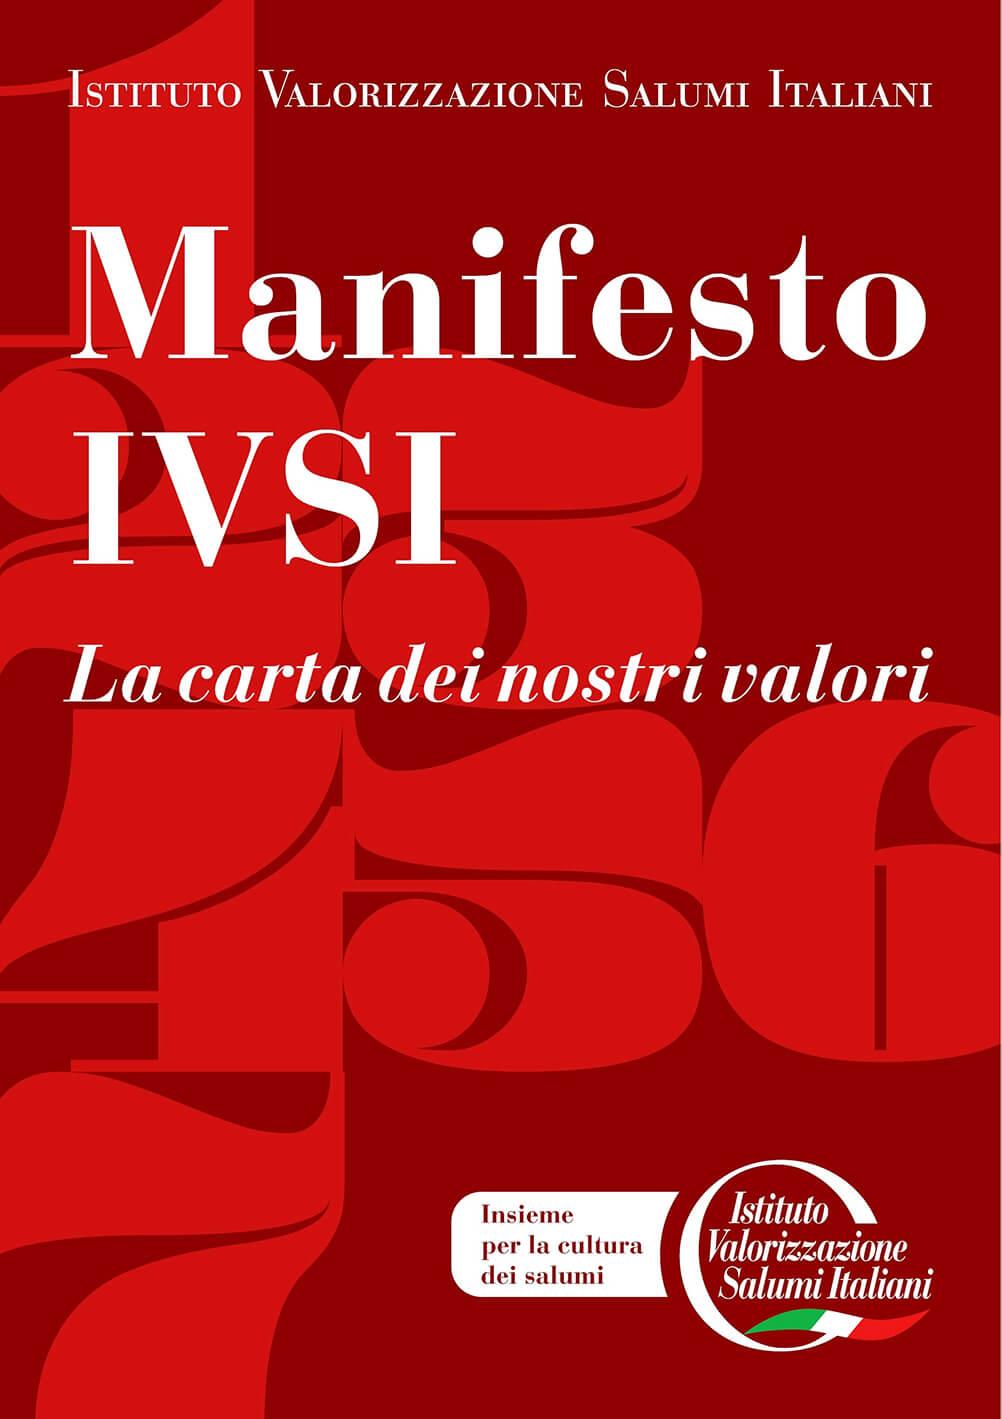 The IVSI Manifesto